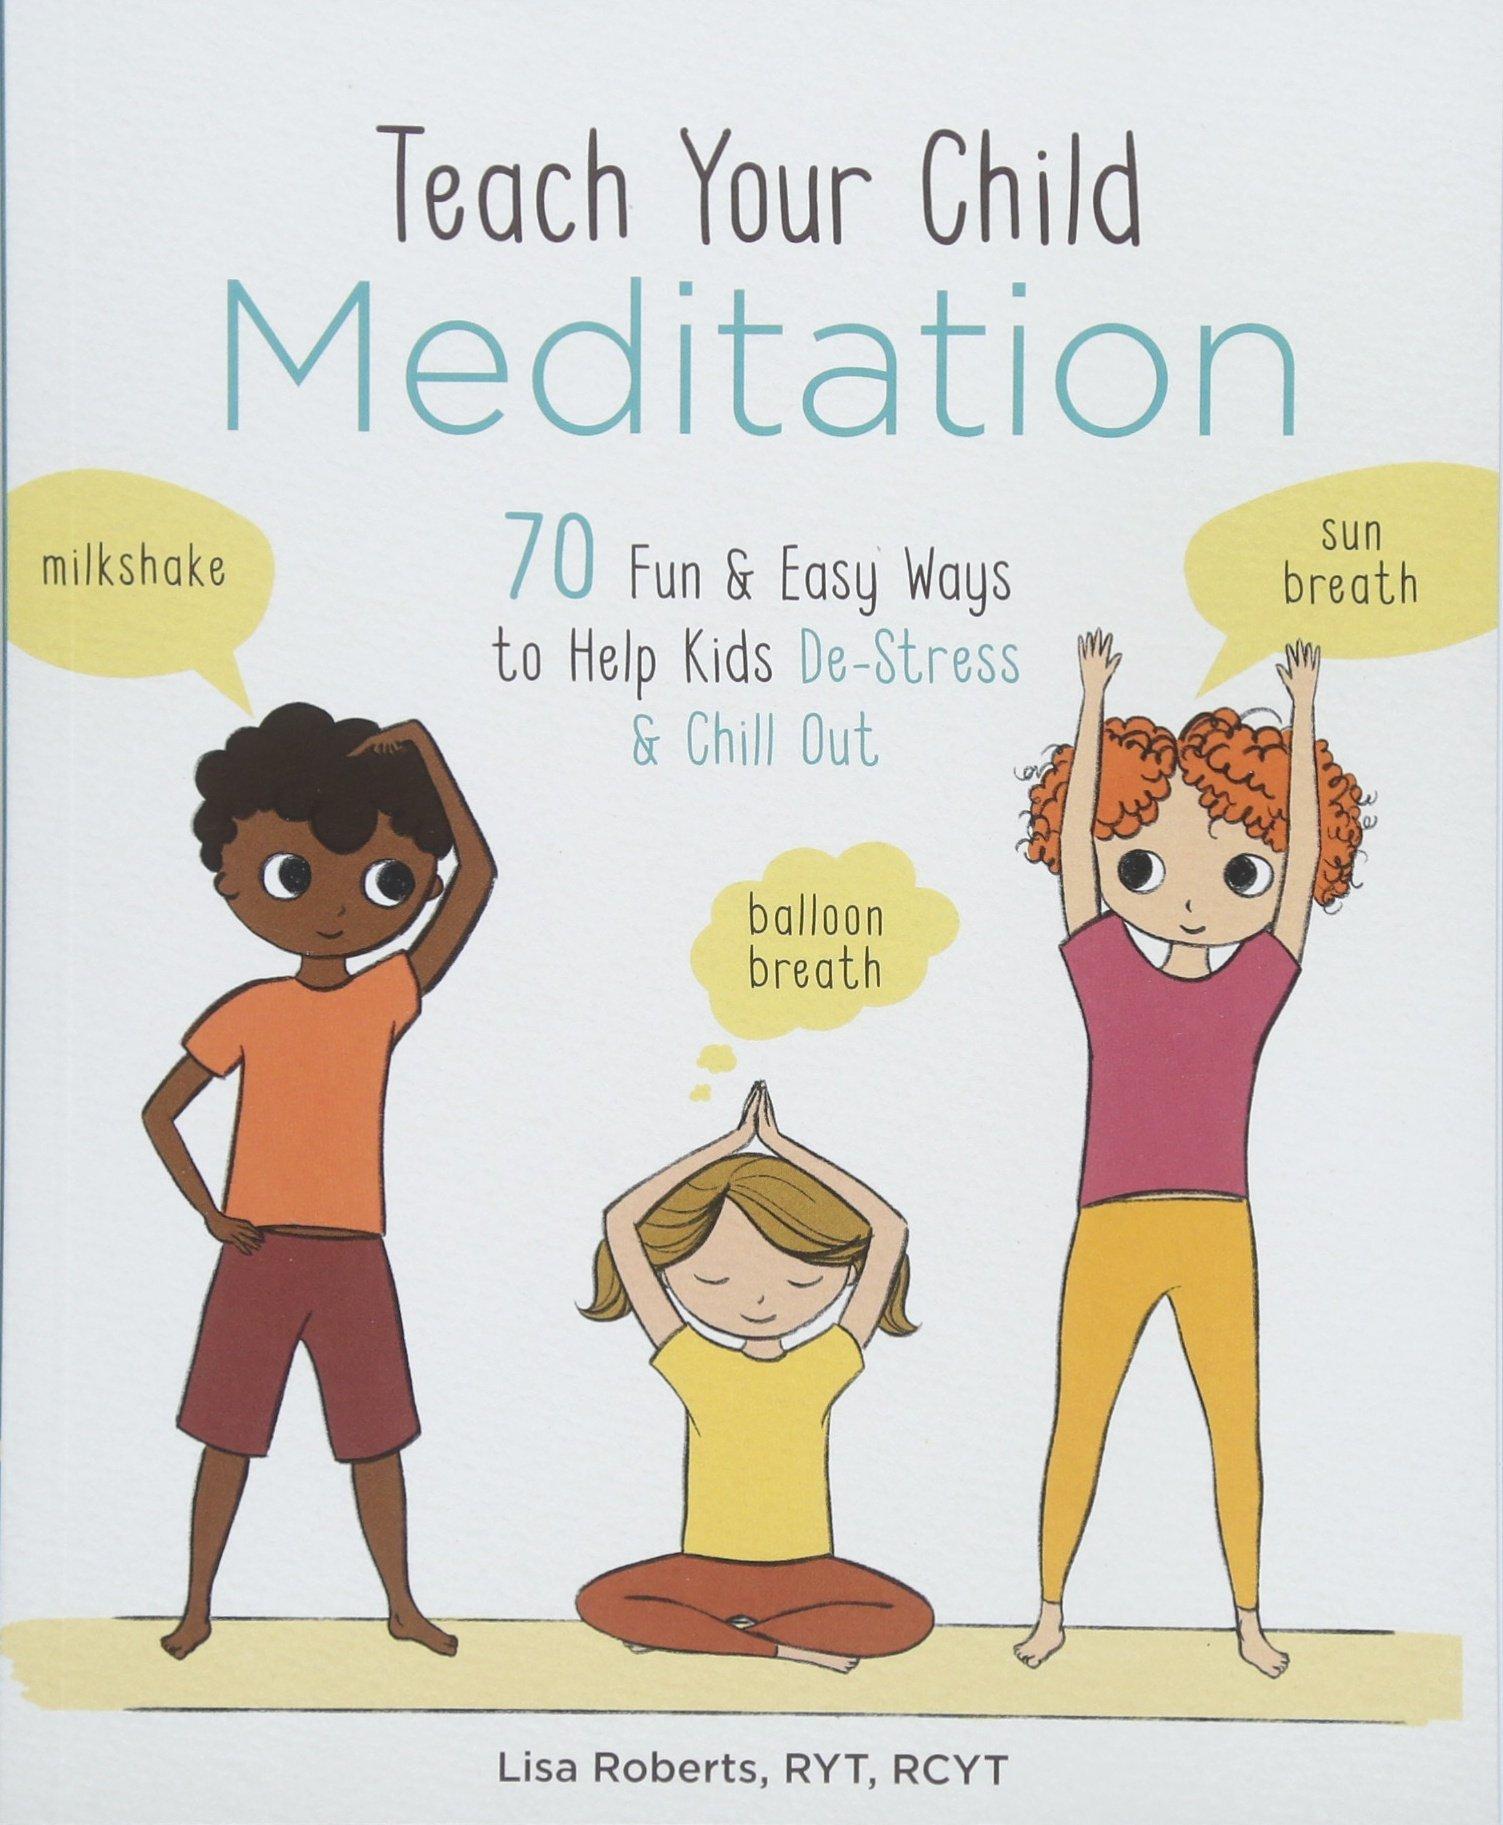 Teach Your Child Meditation: 70 Fun & Easy Ways to Help Kids